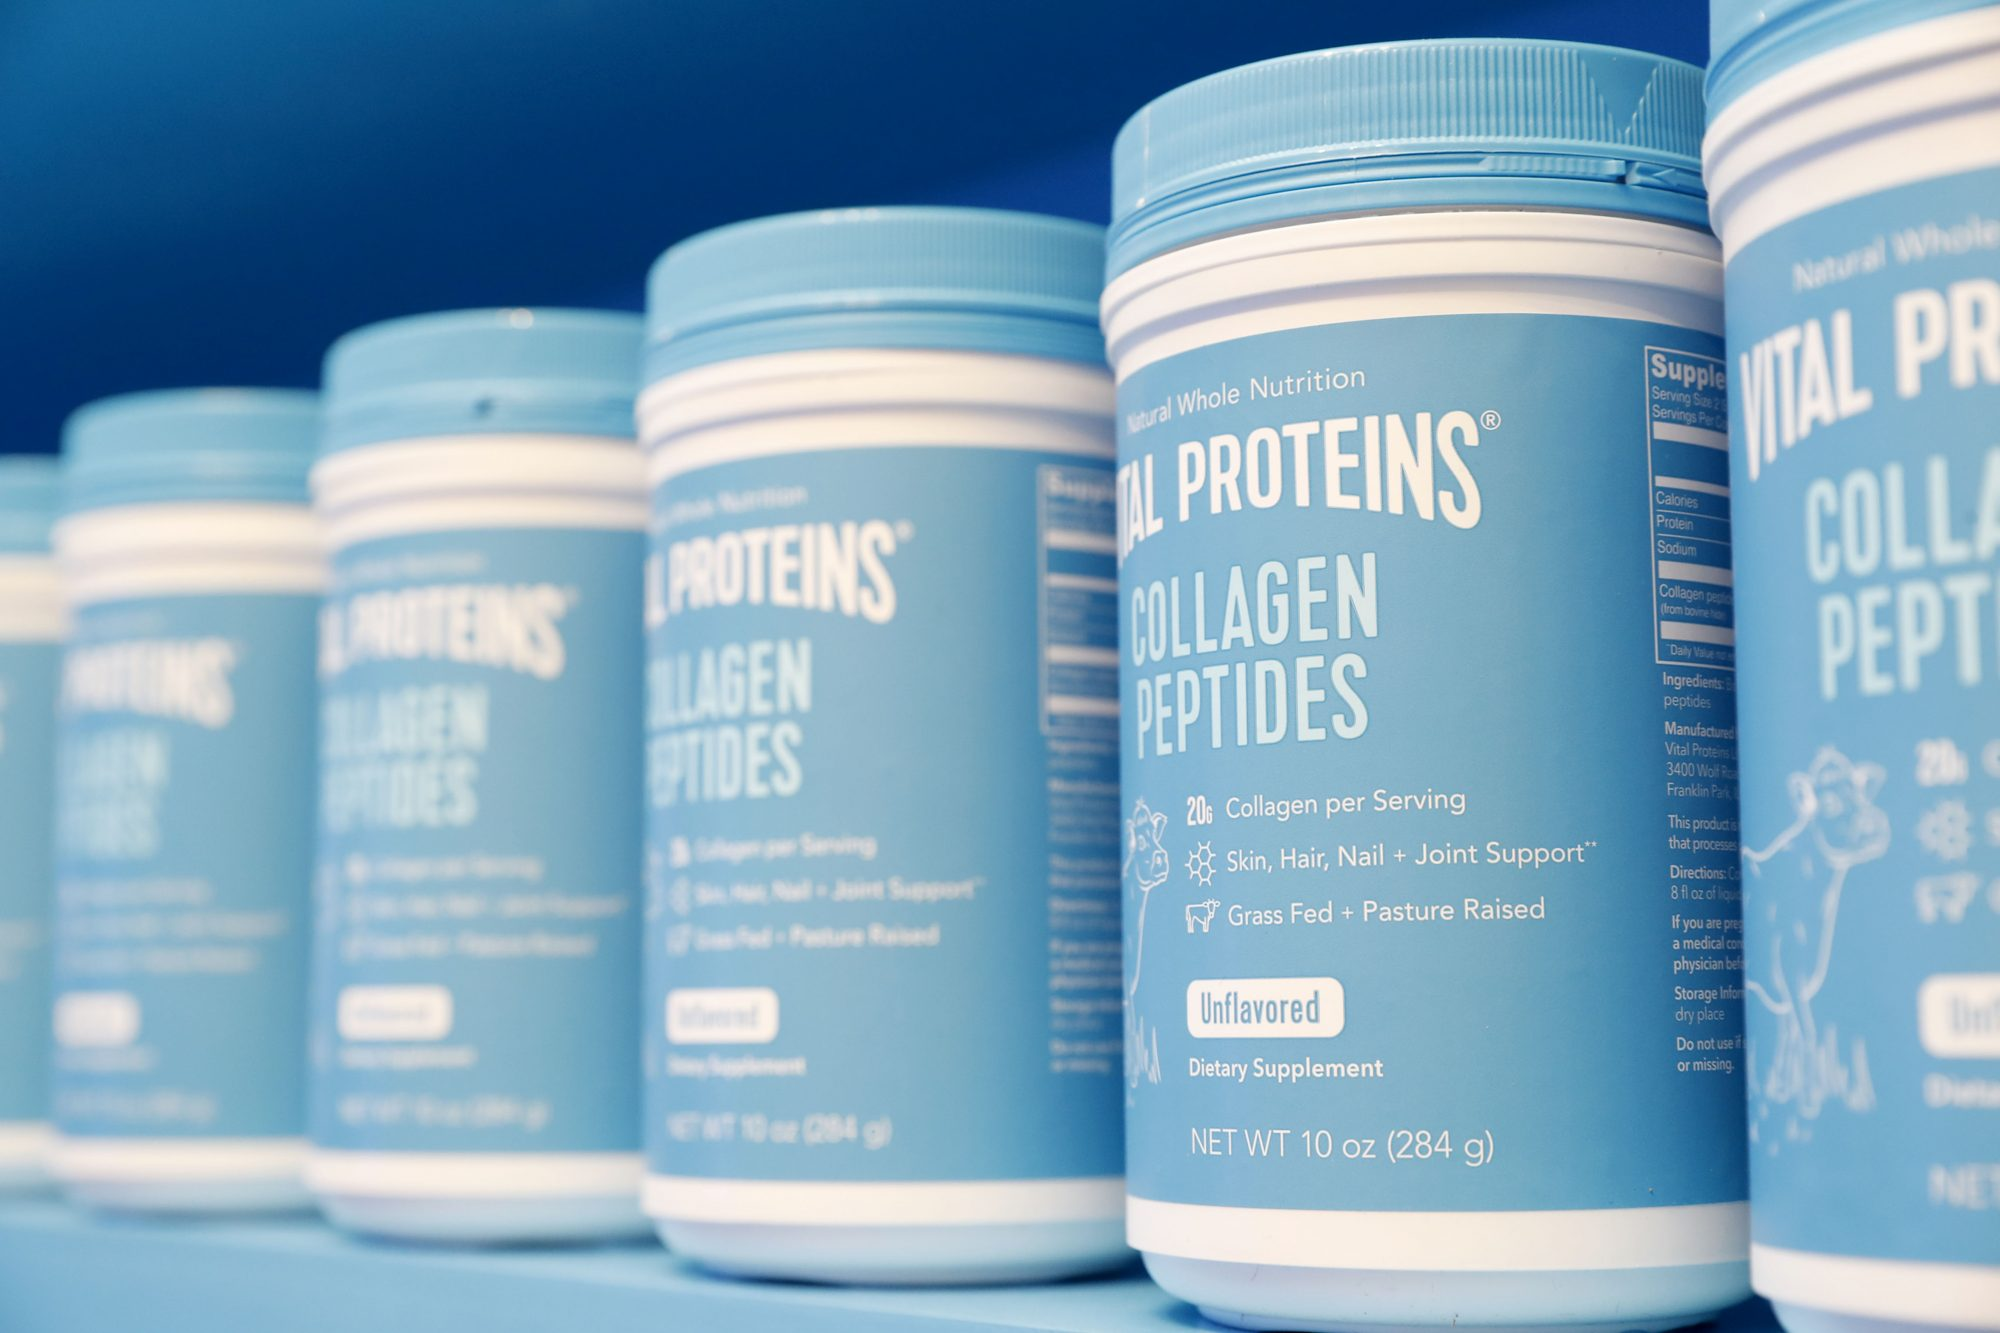 collagenpeptides.jpg